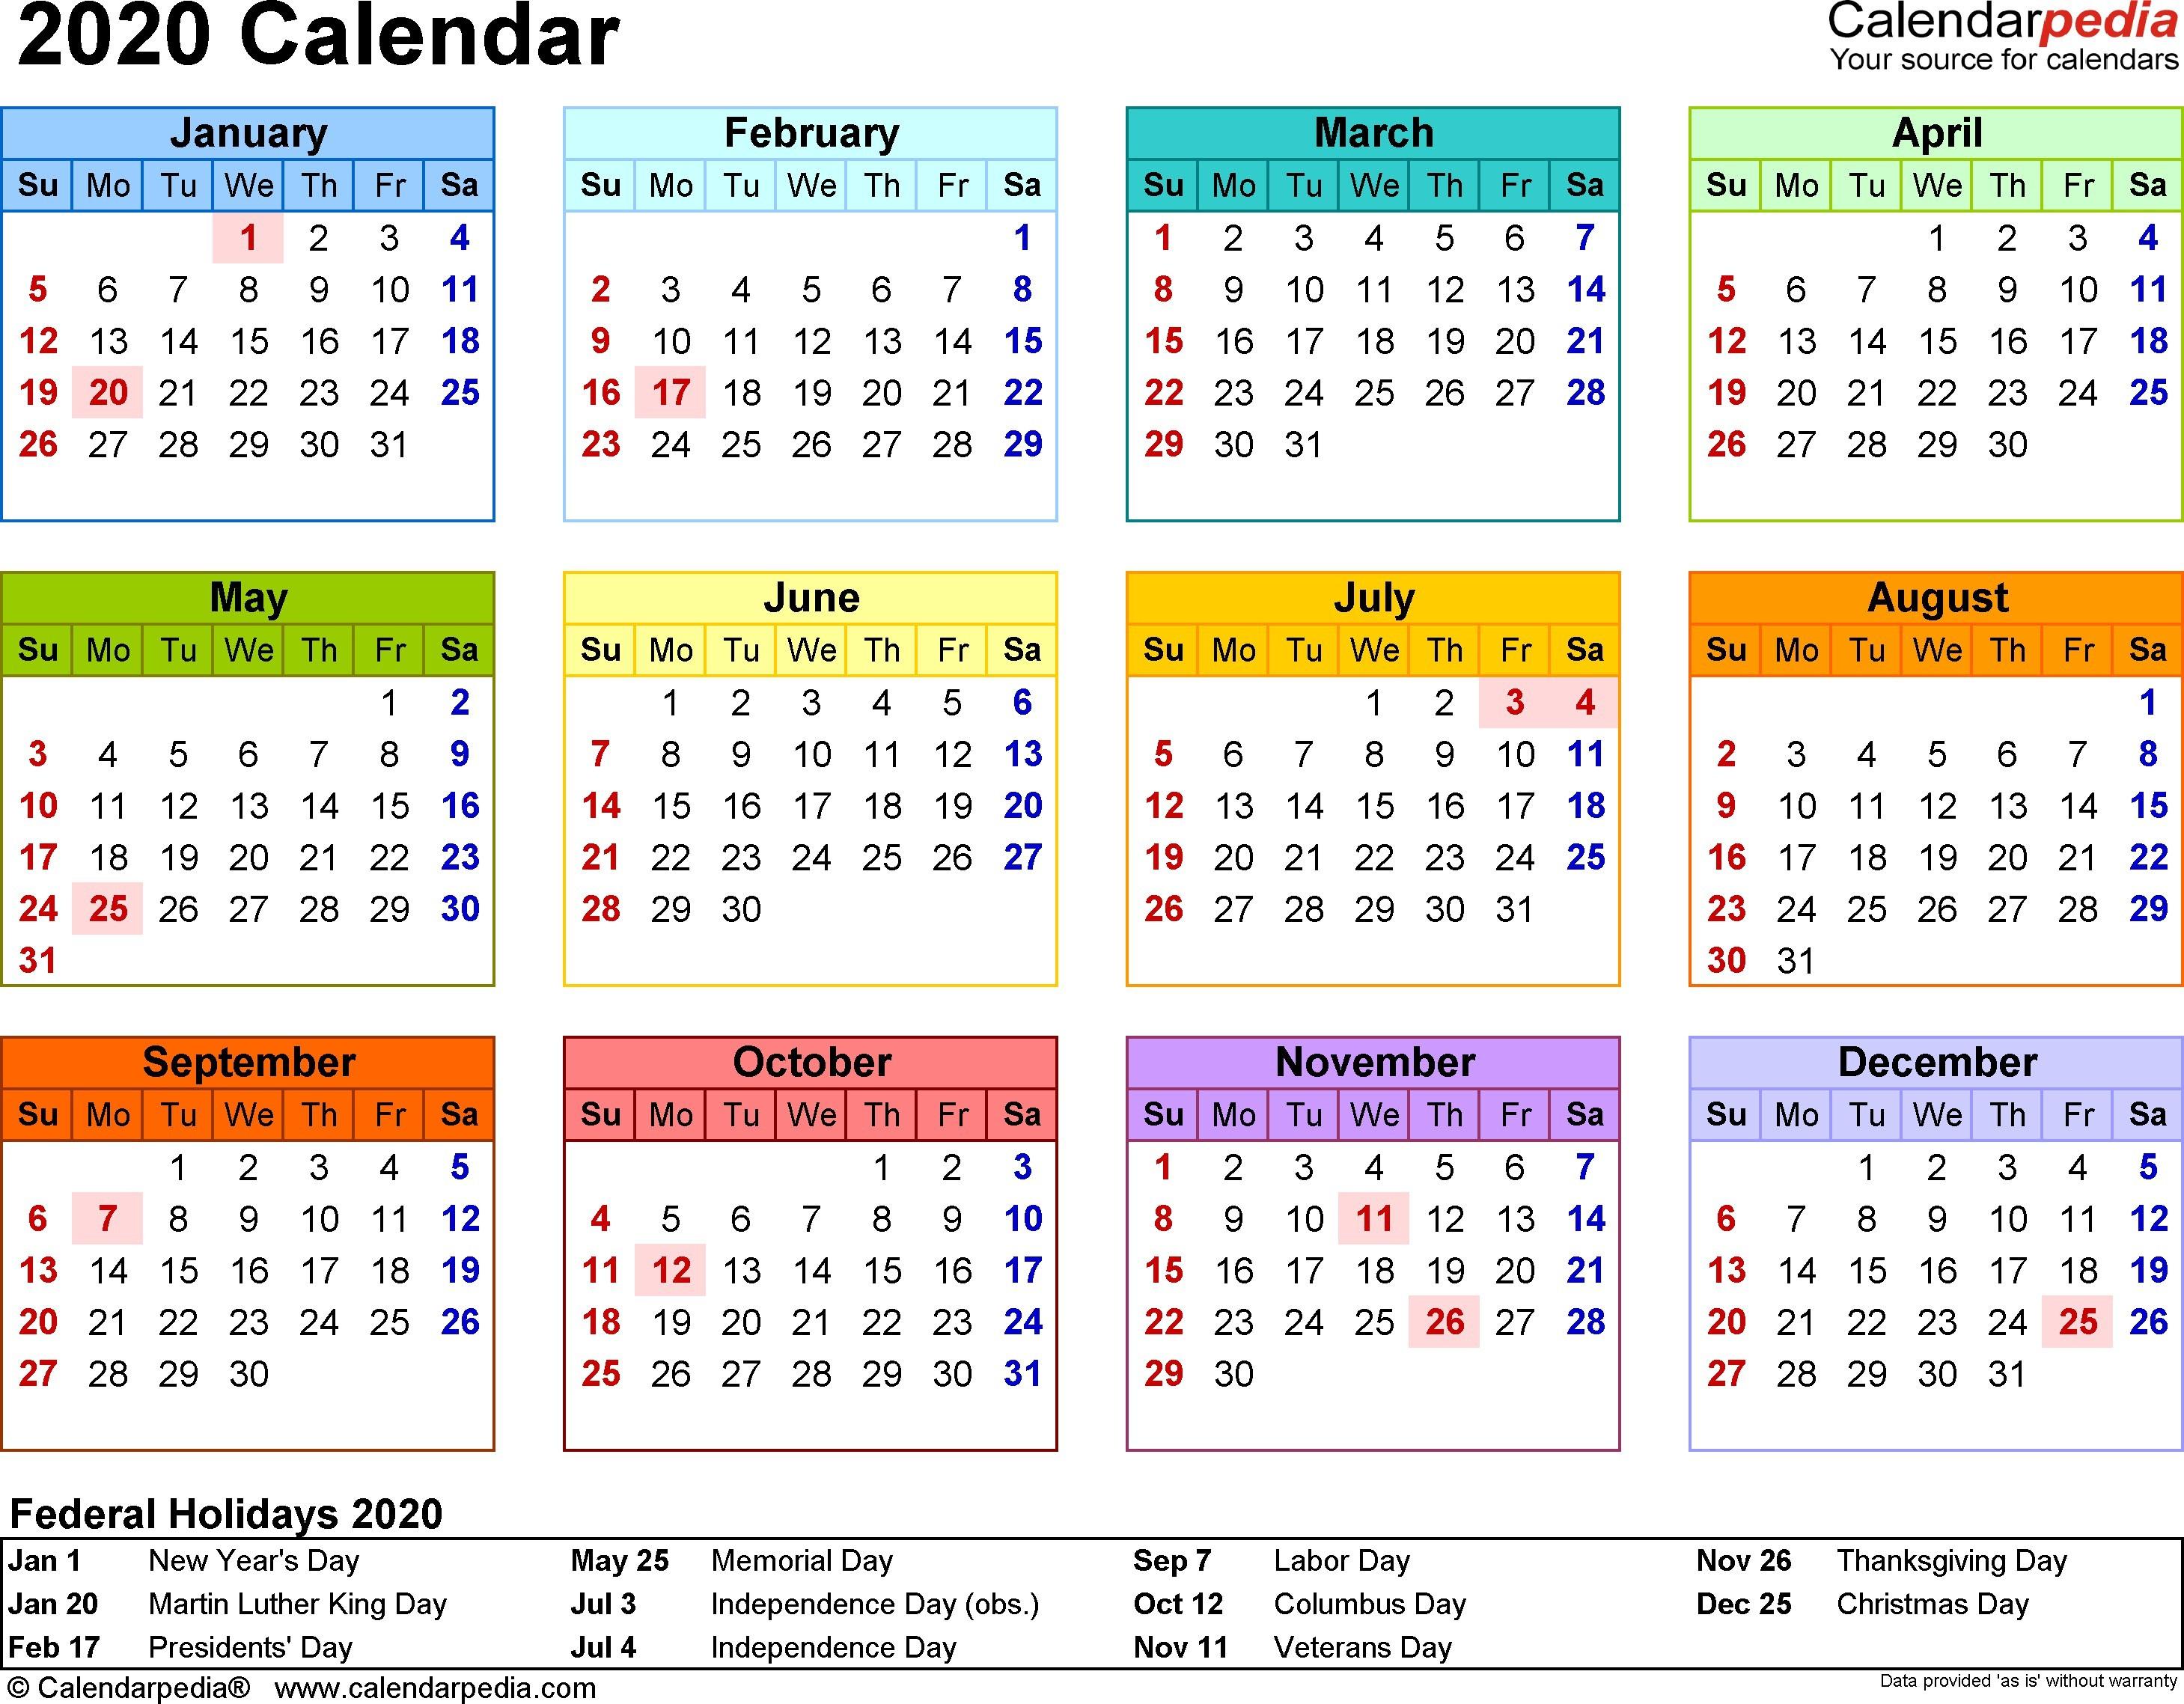 Free 2020 Calendar Printable Best 2020 Calendar Printable E Page Calendar 2019